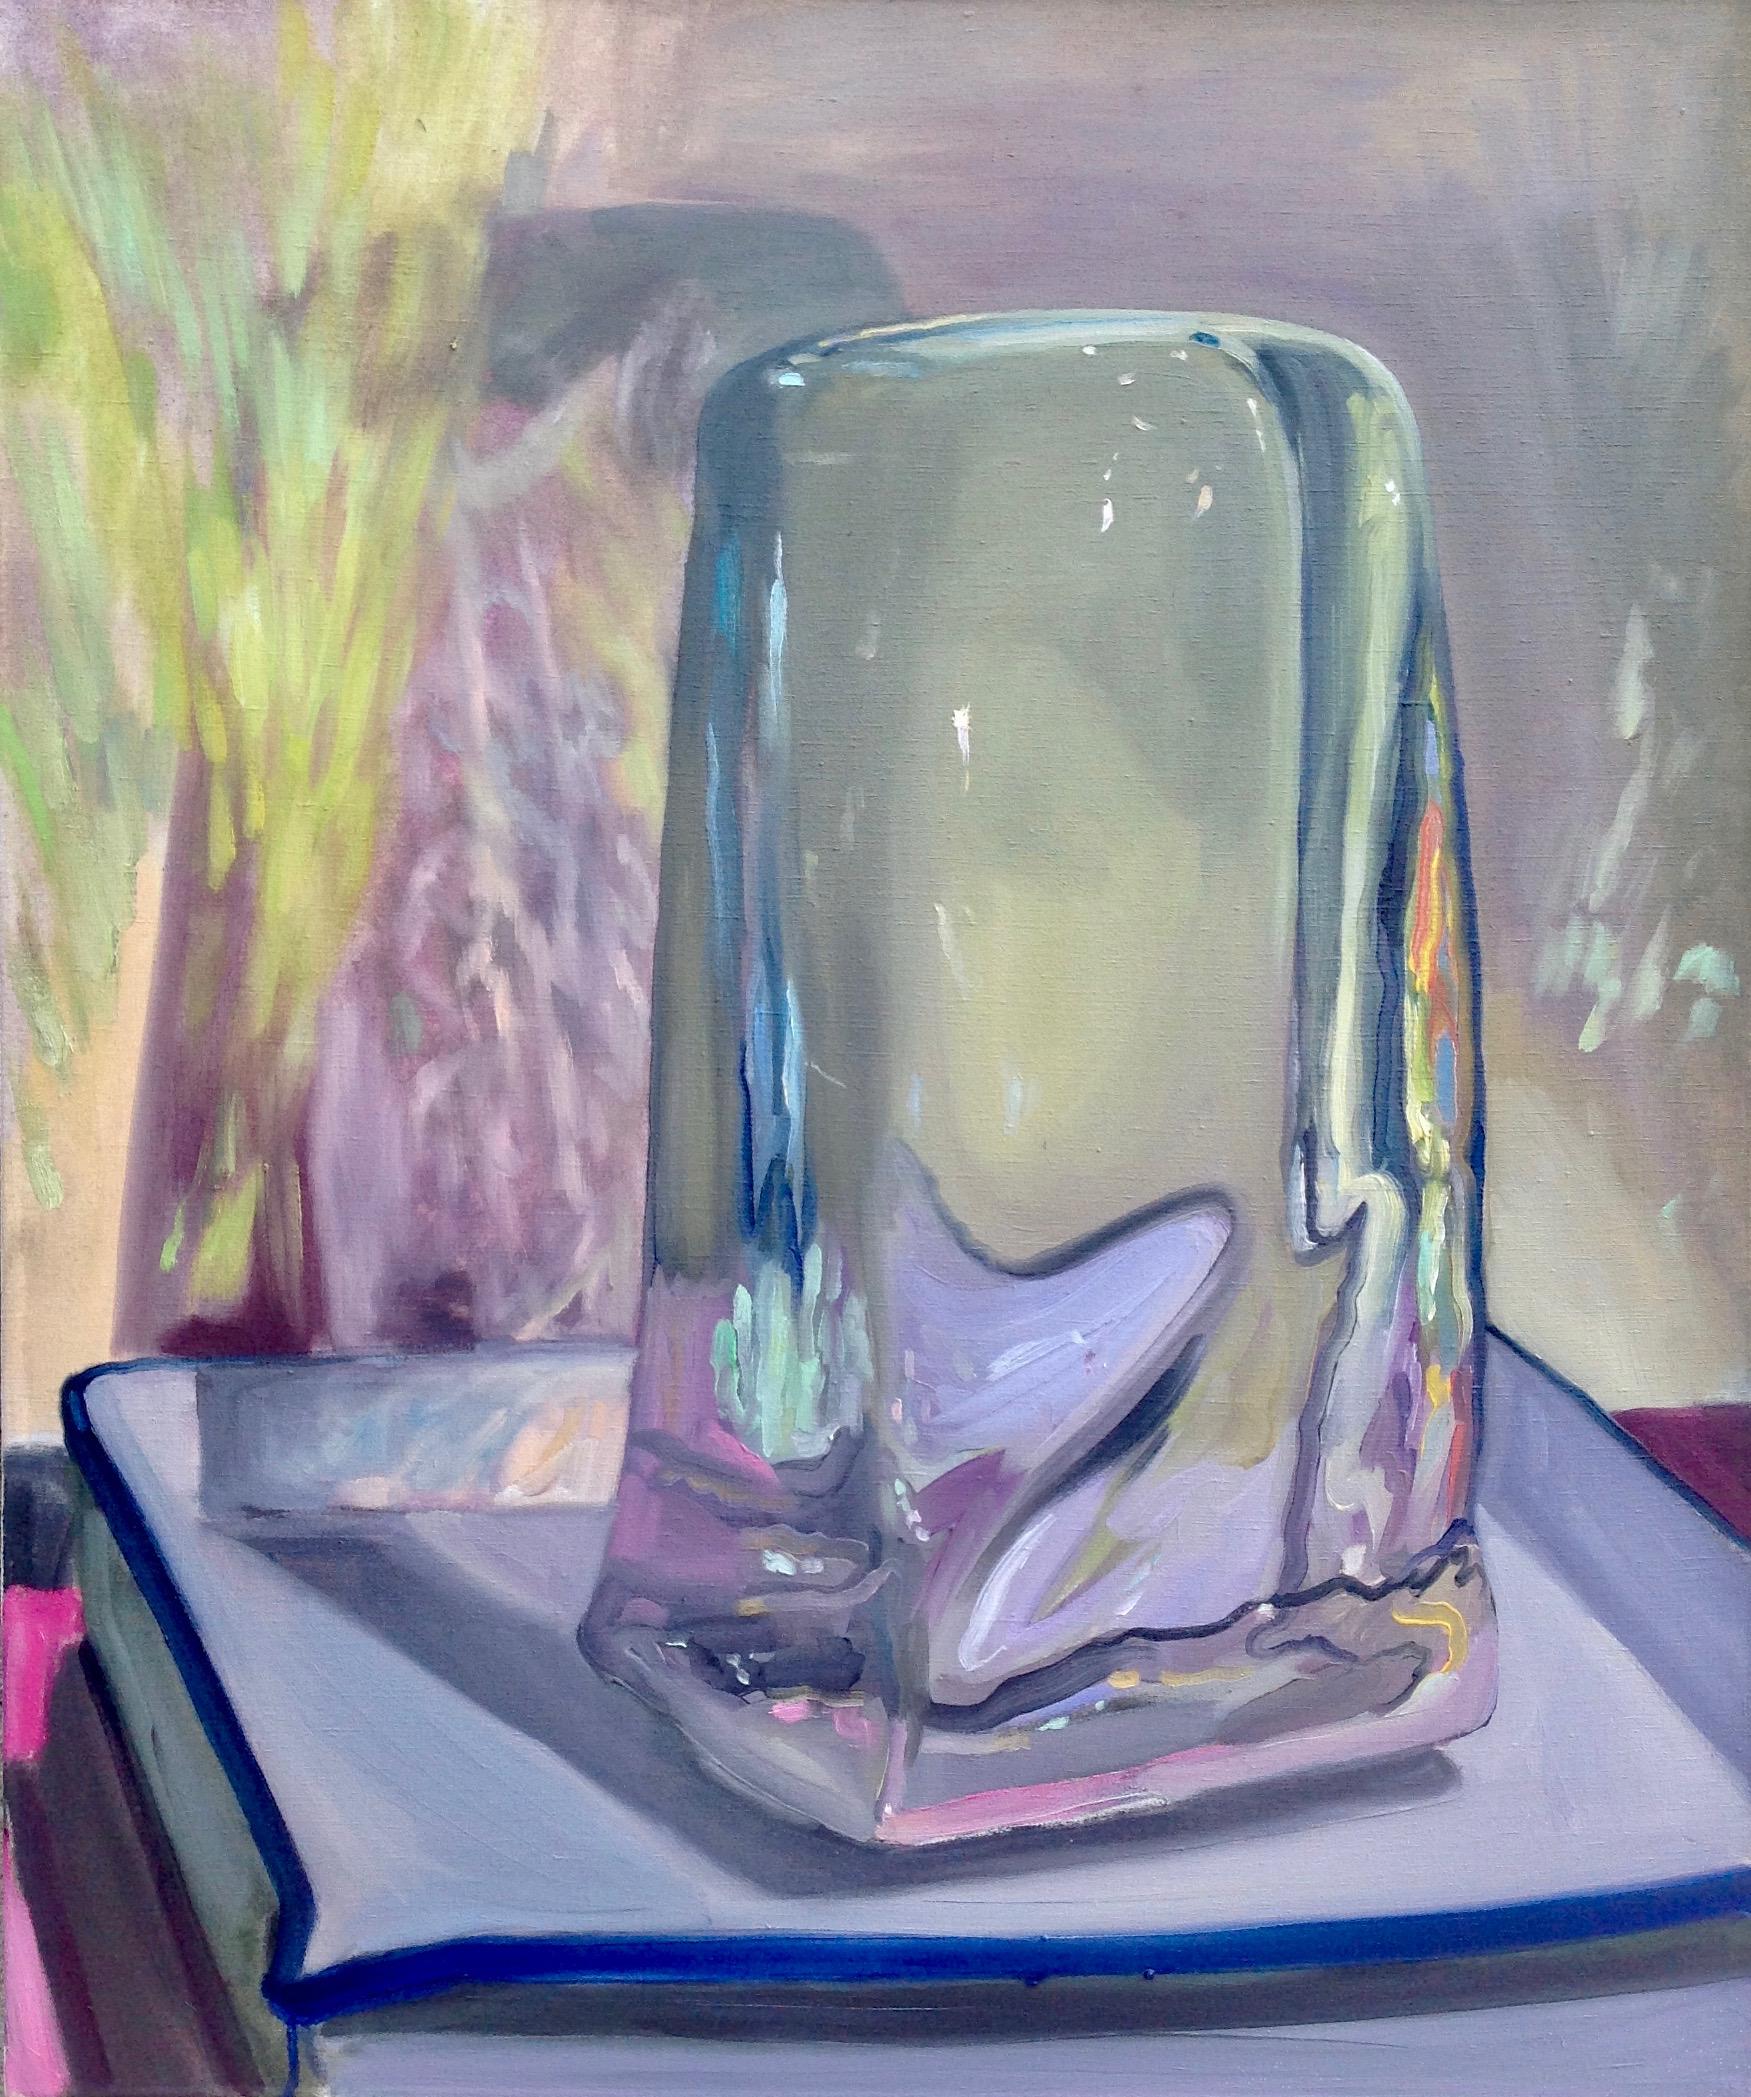 Greta Waller (b. 1983),  Electric Slide , 2018, oil on linen, 36 x 30 inches.